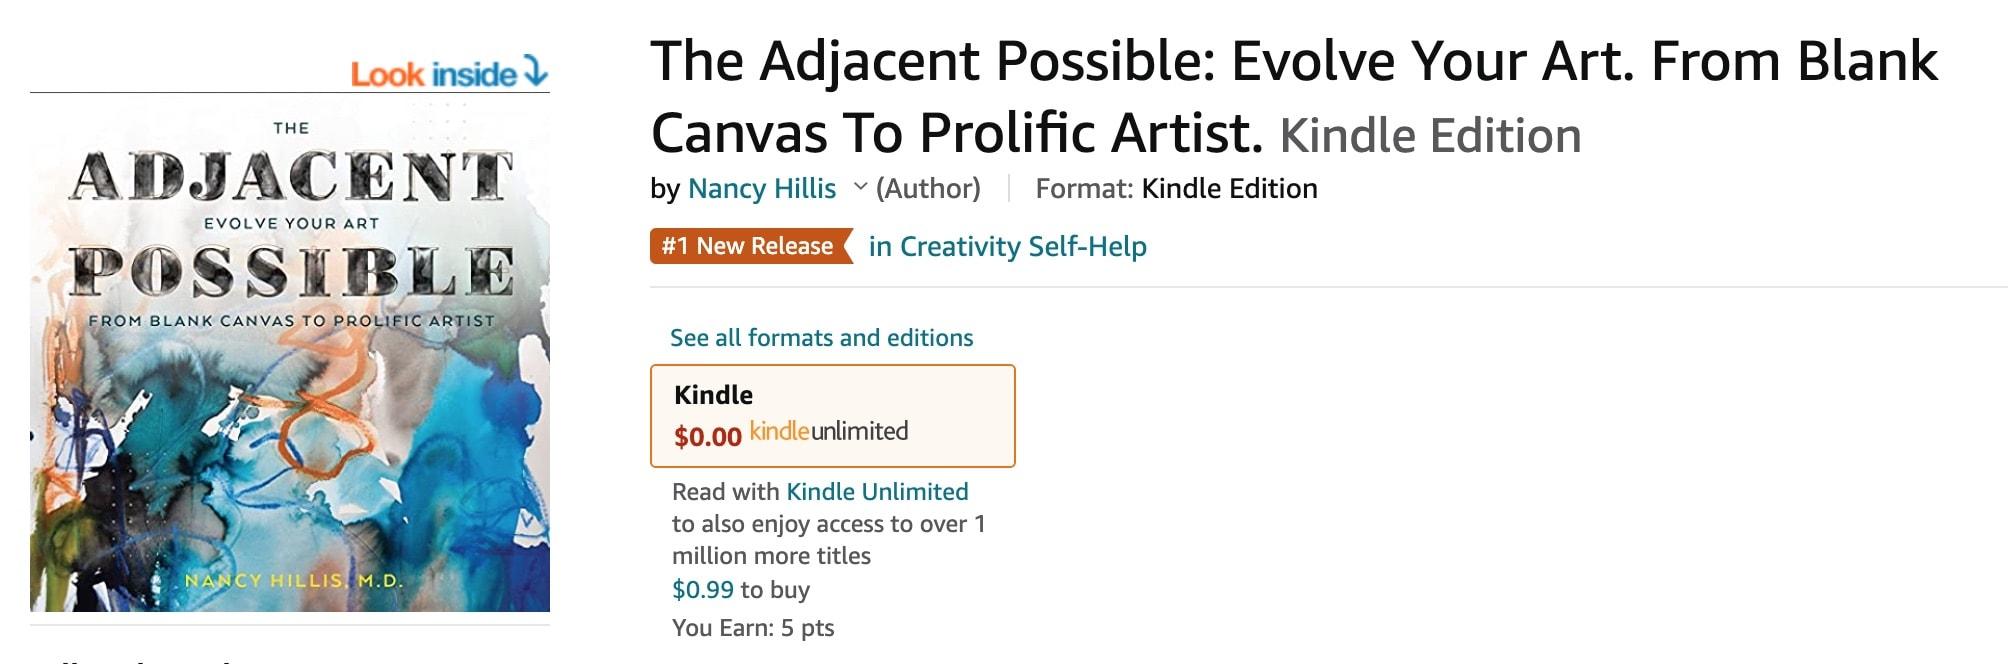 #1 New Release Creativity-Self-Help